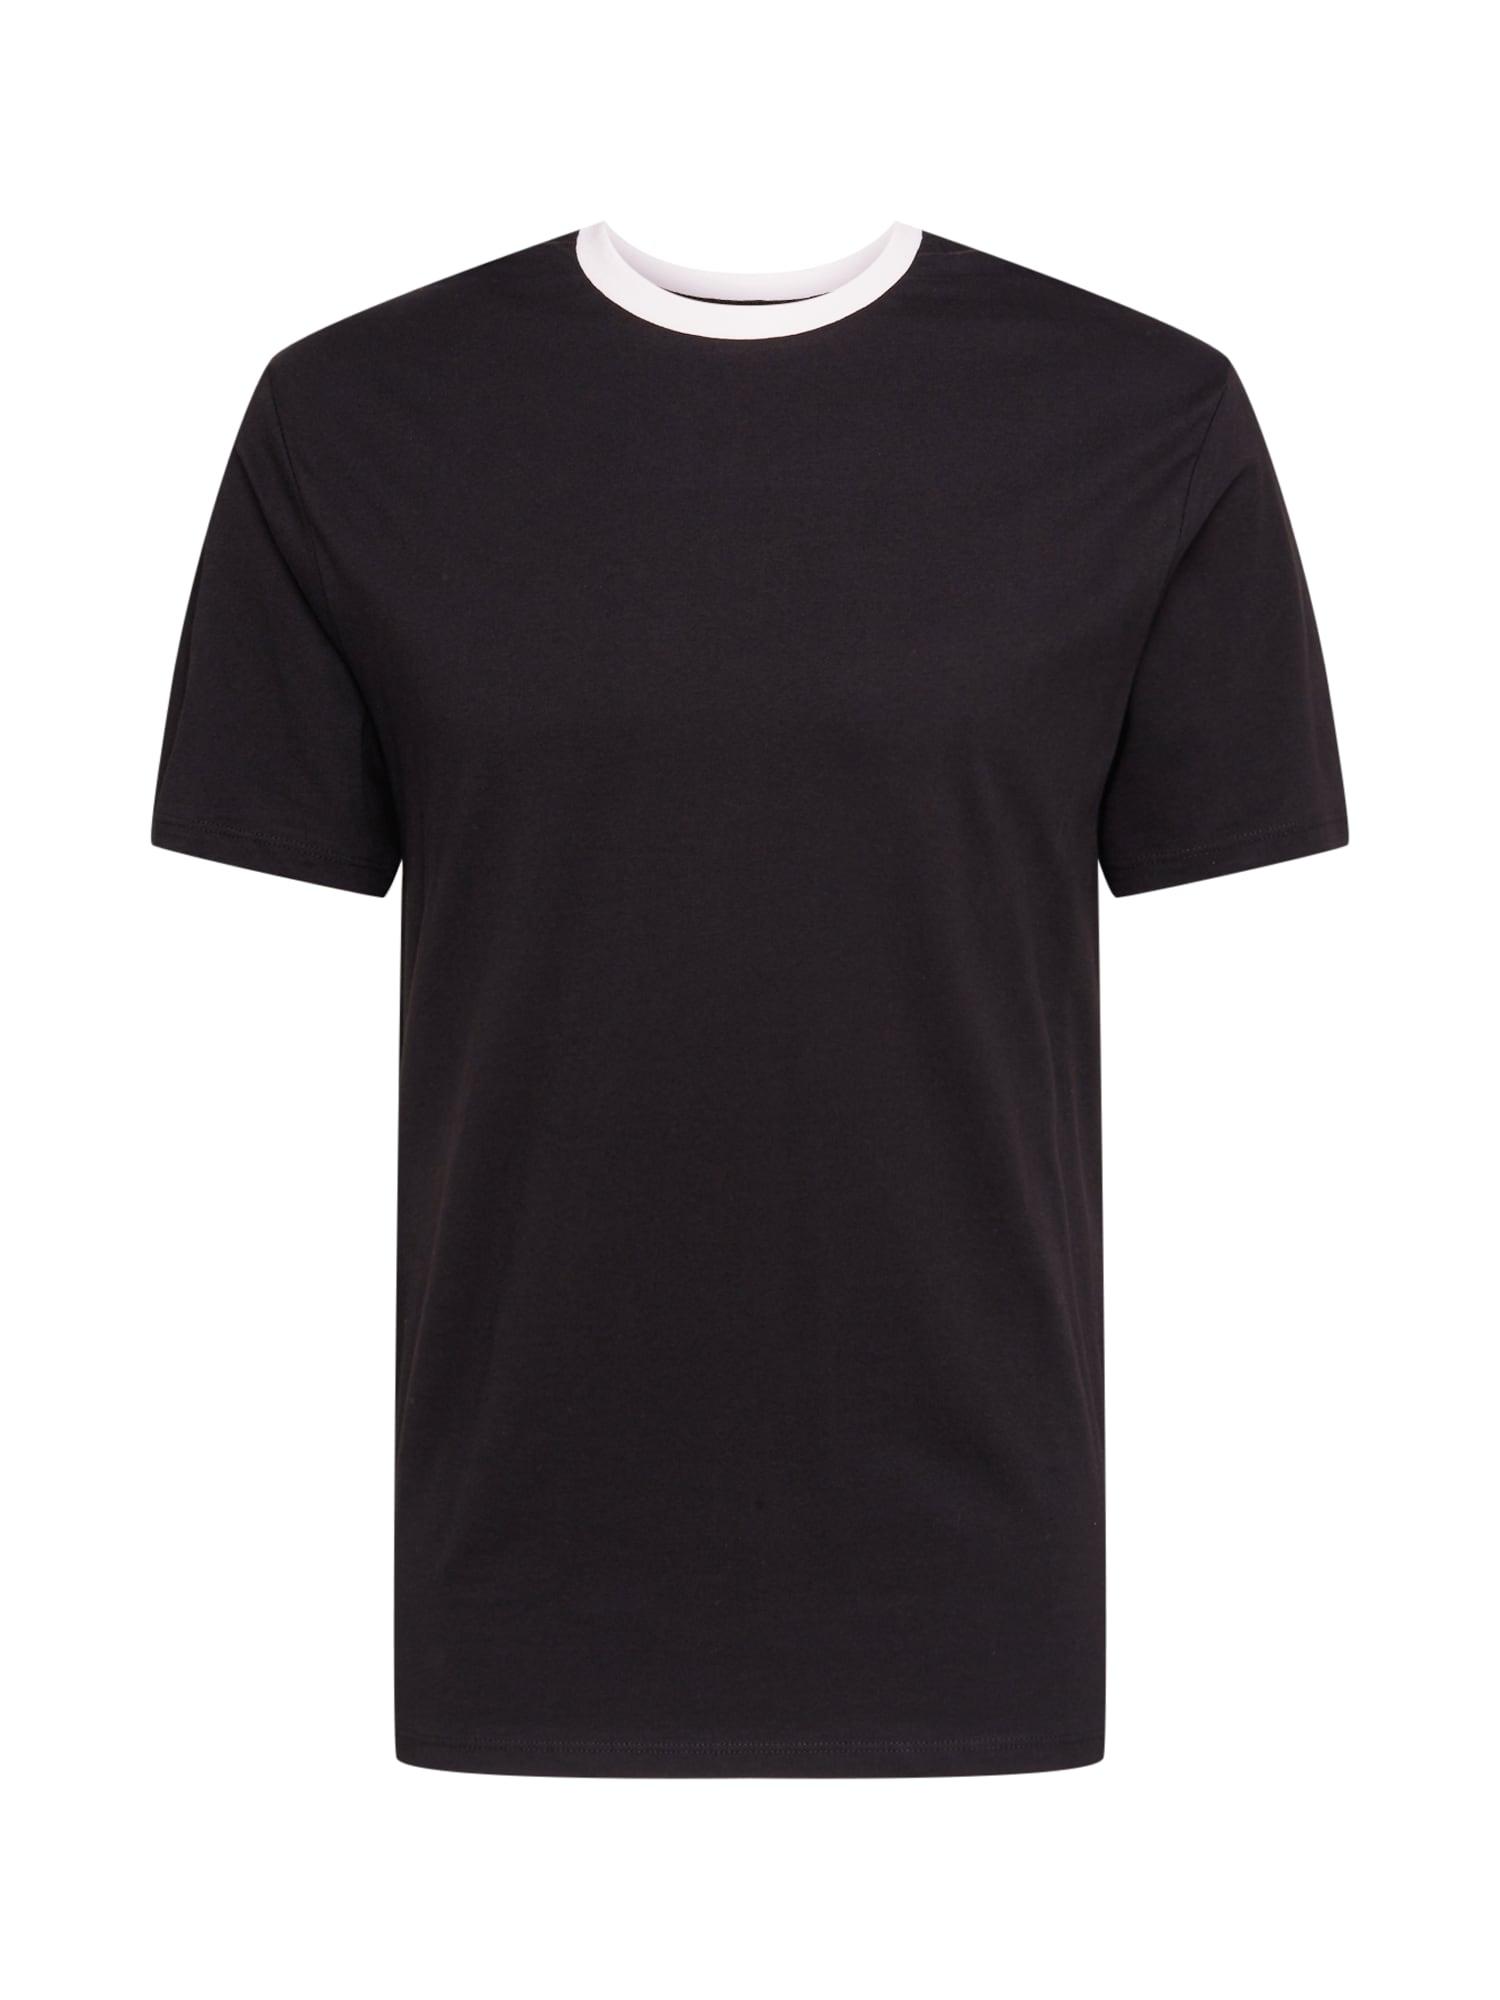 Mennace Tričko  čierna / biela